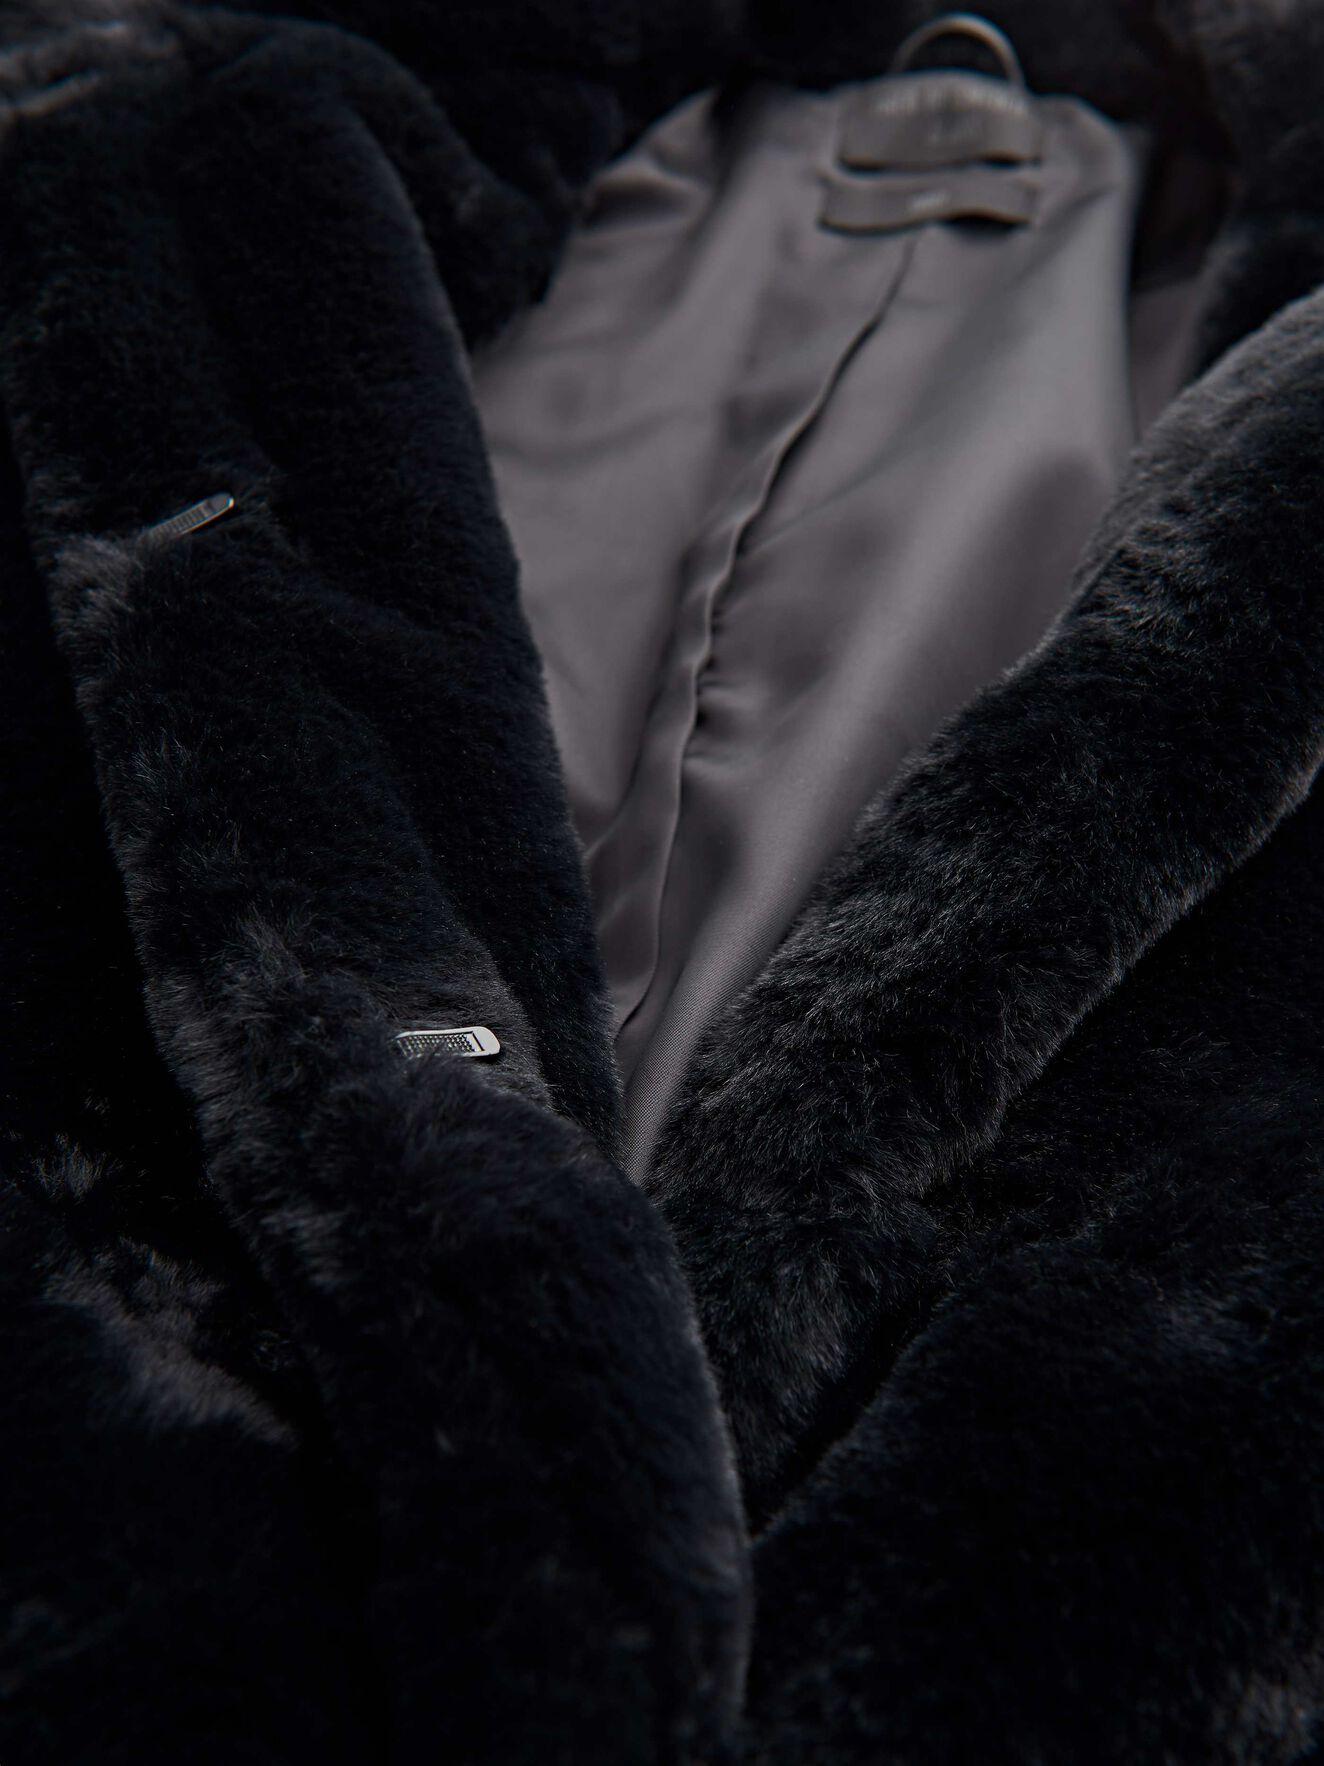 Lola Coat in Black from Tiger of Sweden